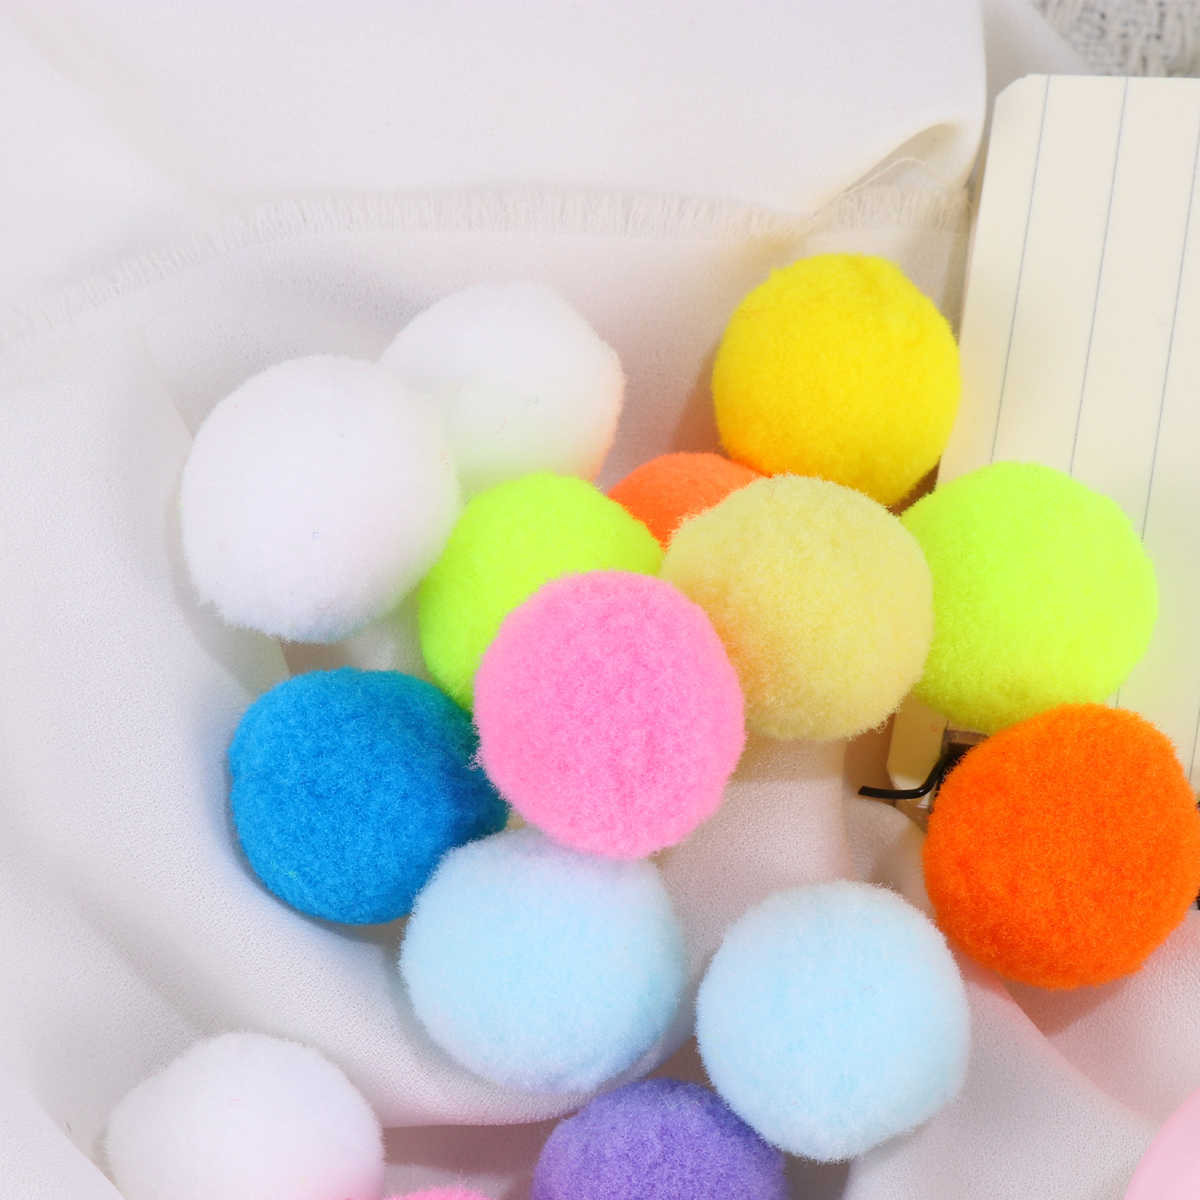 100 Pcs 2.5 Cm Multicolor Pompoms Tinggi Elastis Rambut Kecil Bola Buatan Tangan DIY Plush Balls Pakaian DIY Seni Kerajinan Aksesoris